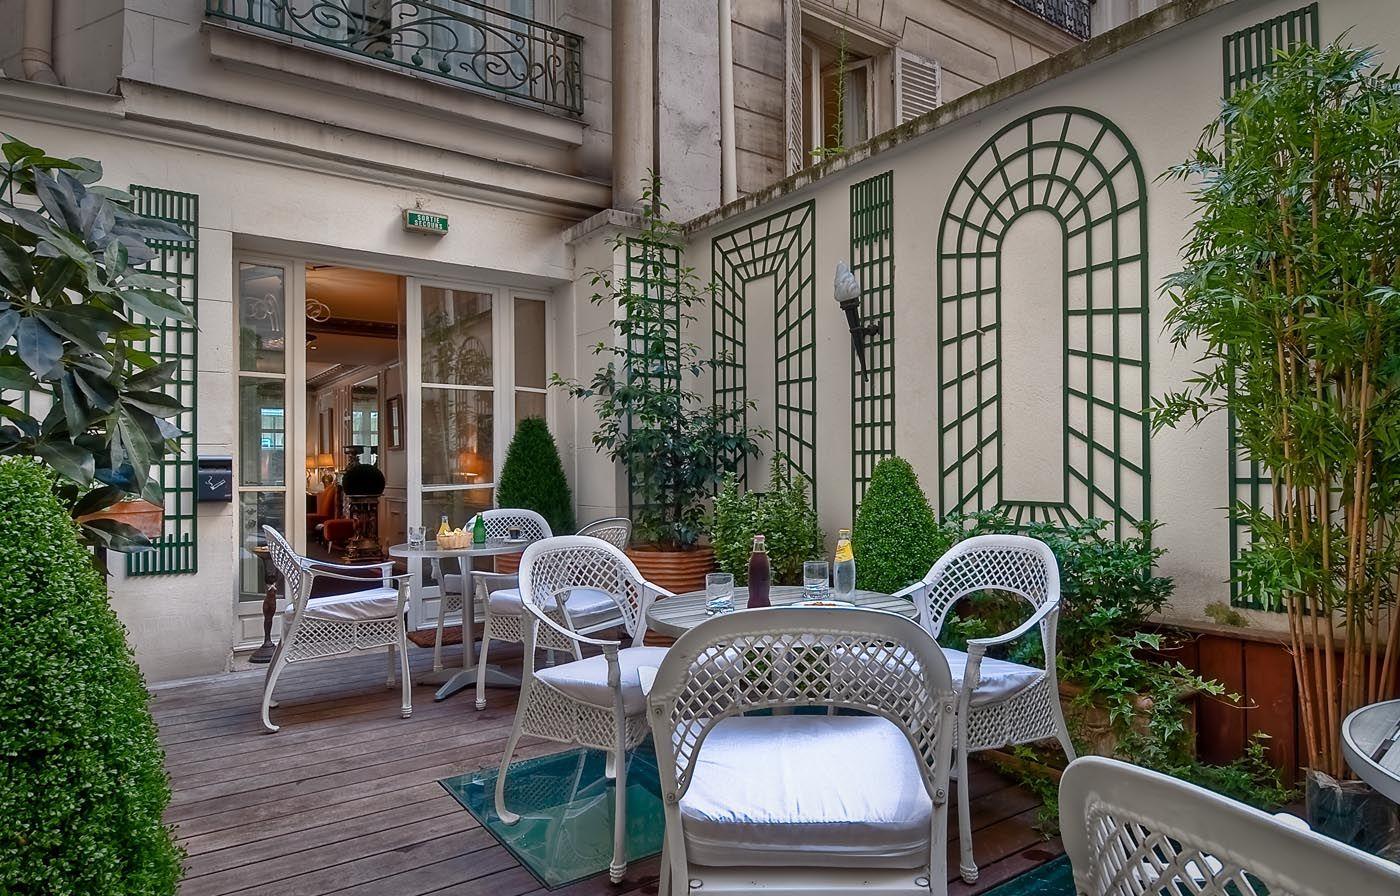 Hotel paris elys es ceramic recep o de hotel de charme for Paris hotel de charme